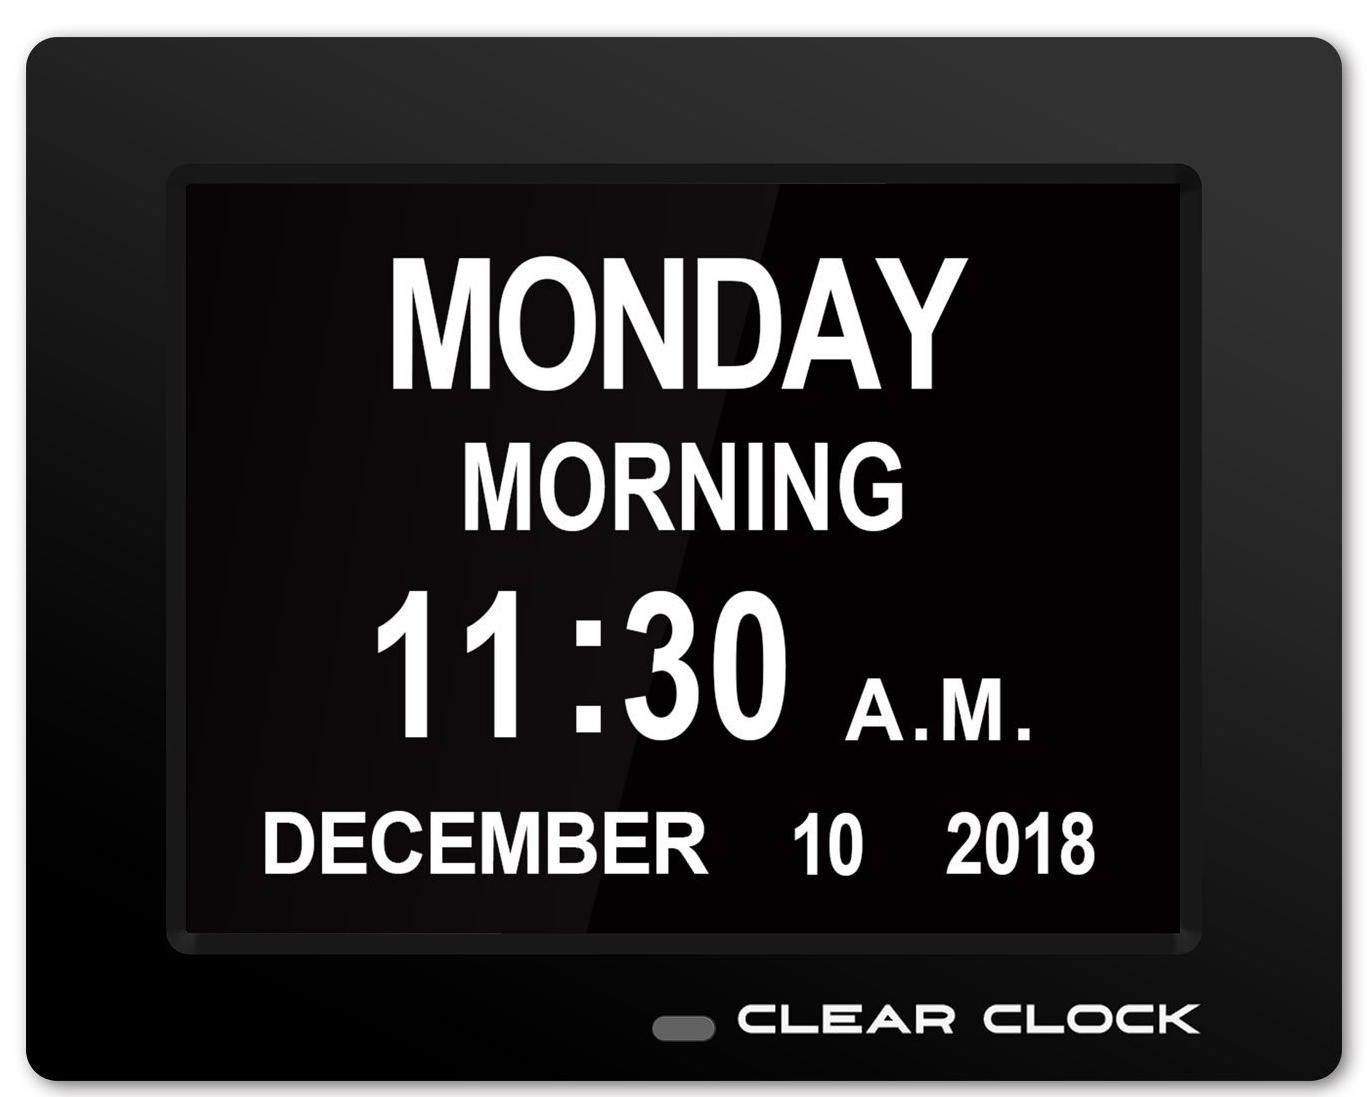 Clear Clock $34.99 + Free Shipping @ Amazon